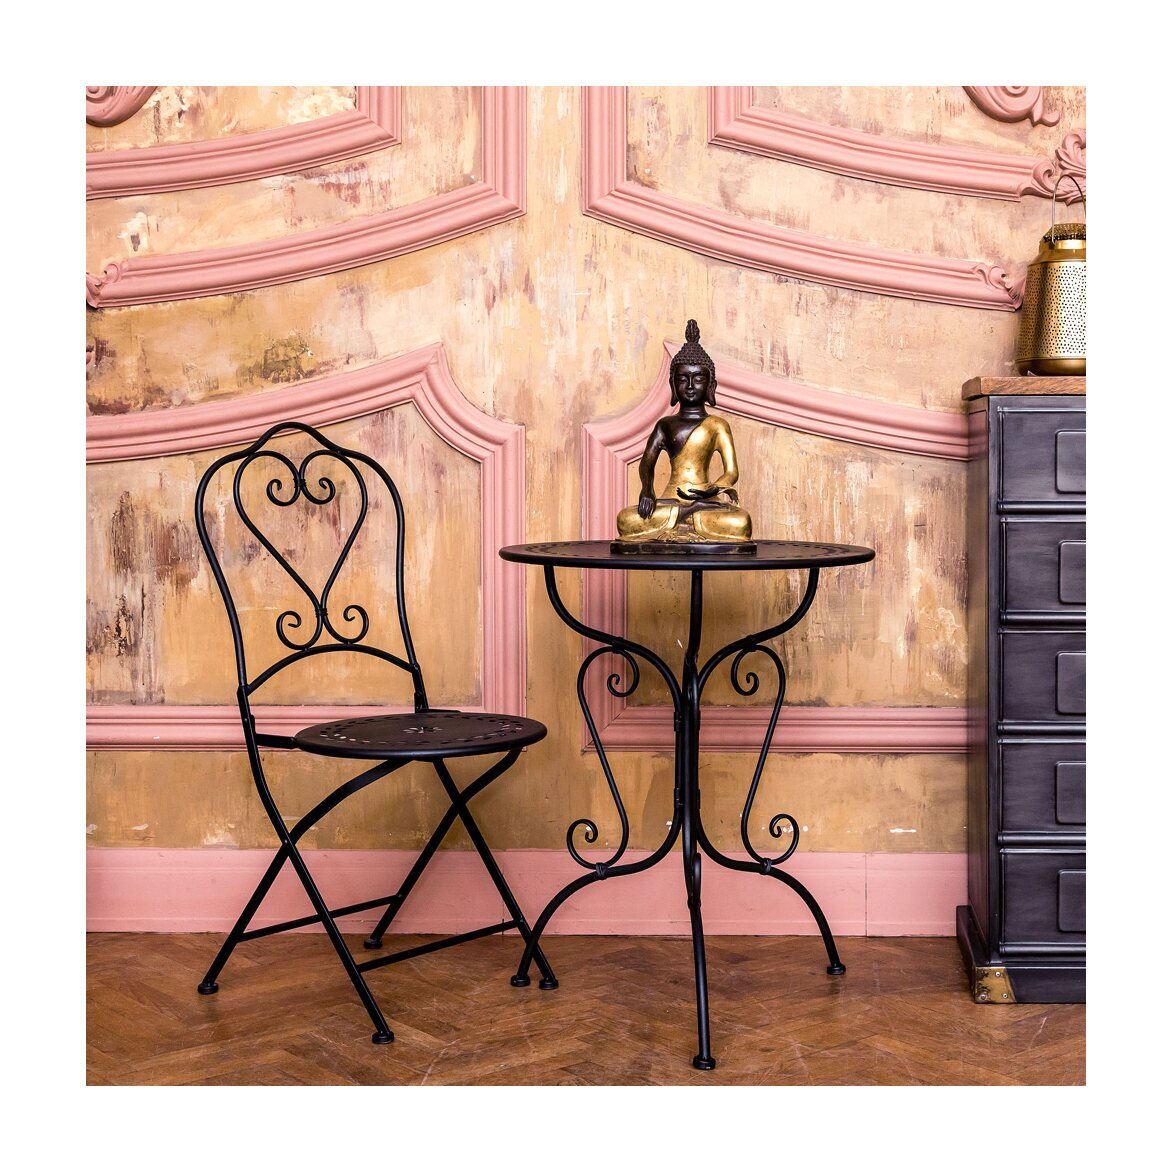 Складной стул «Жарден» (черный антик) 4 | Обеденные стулья Kingsby